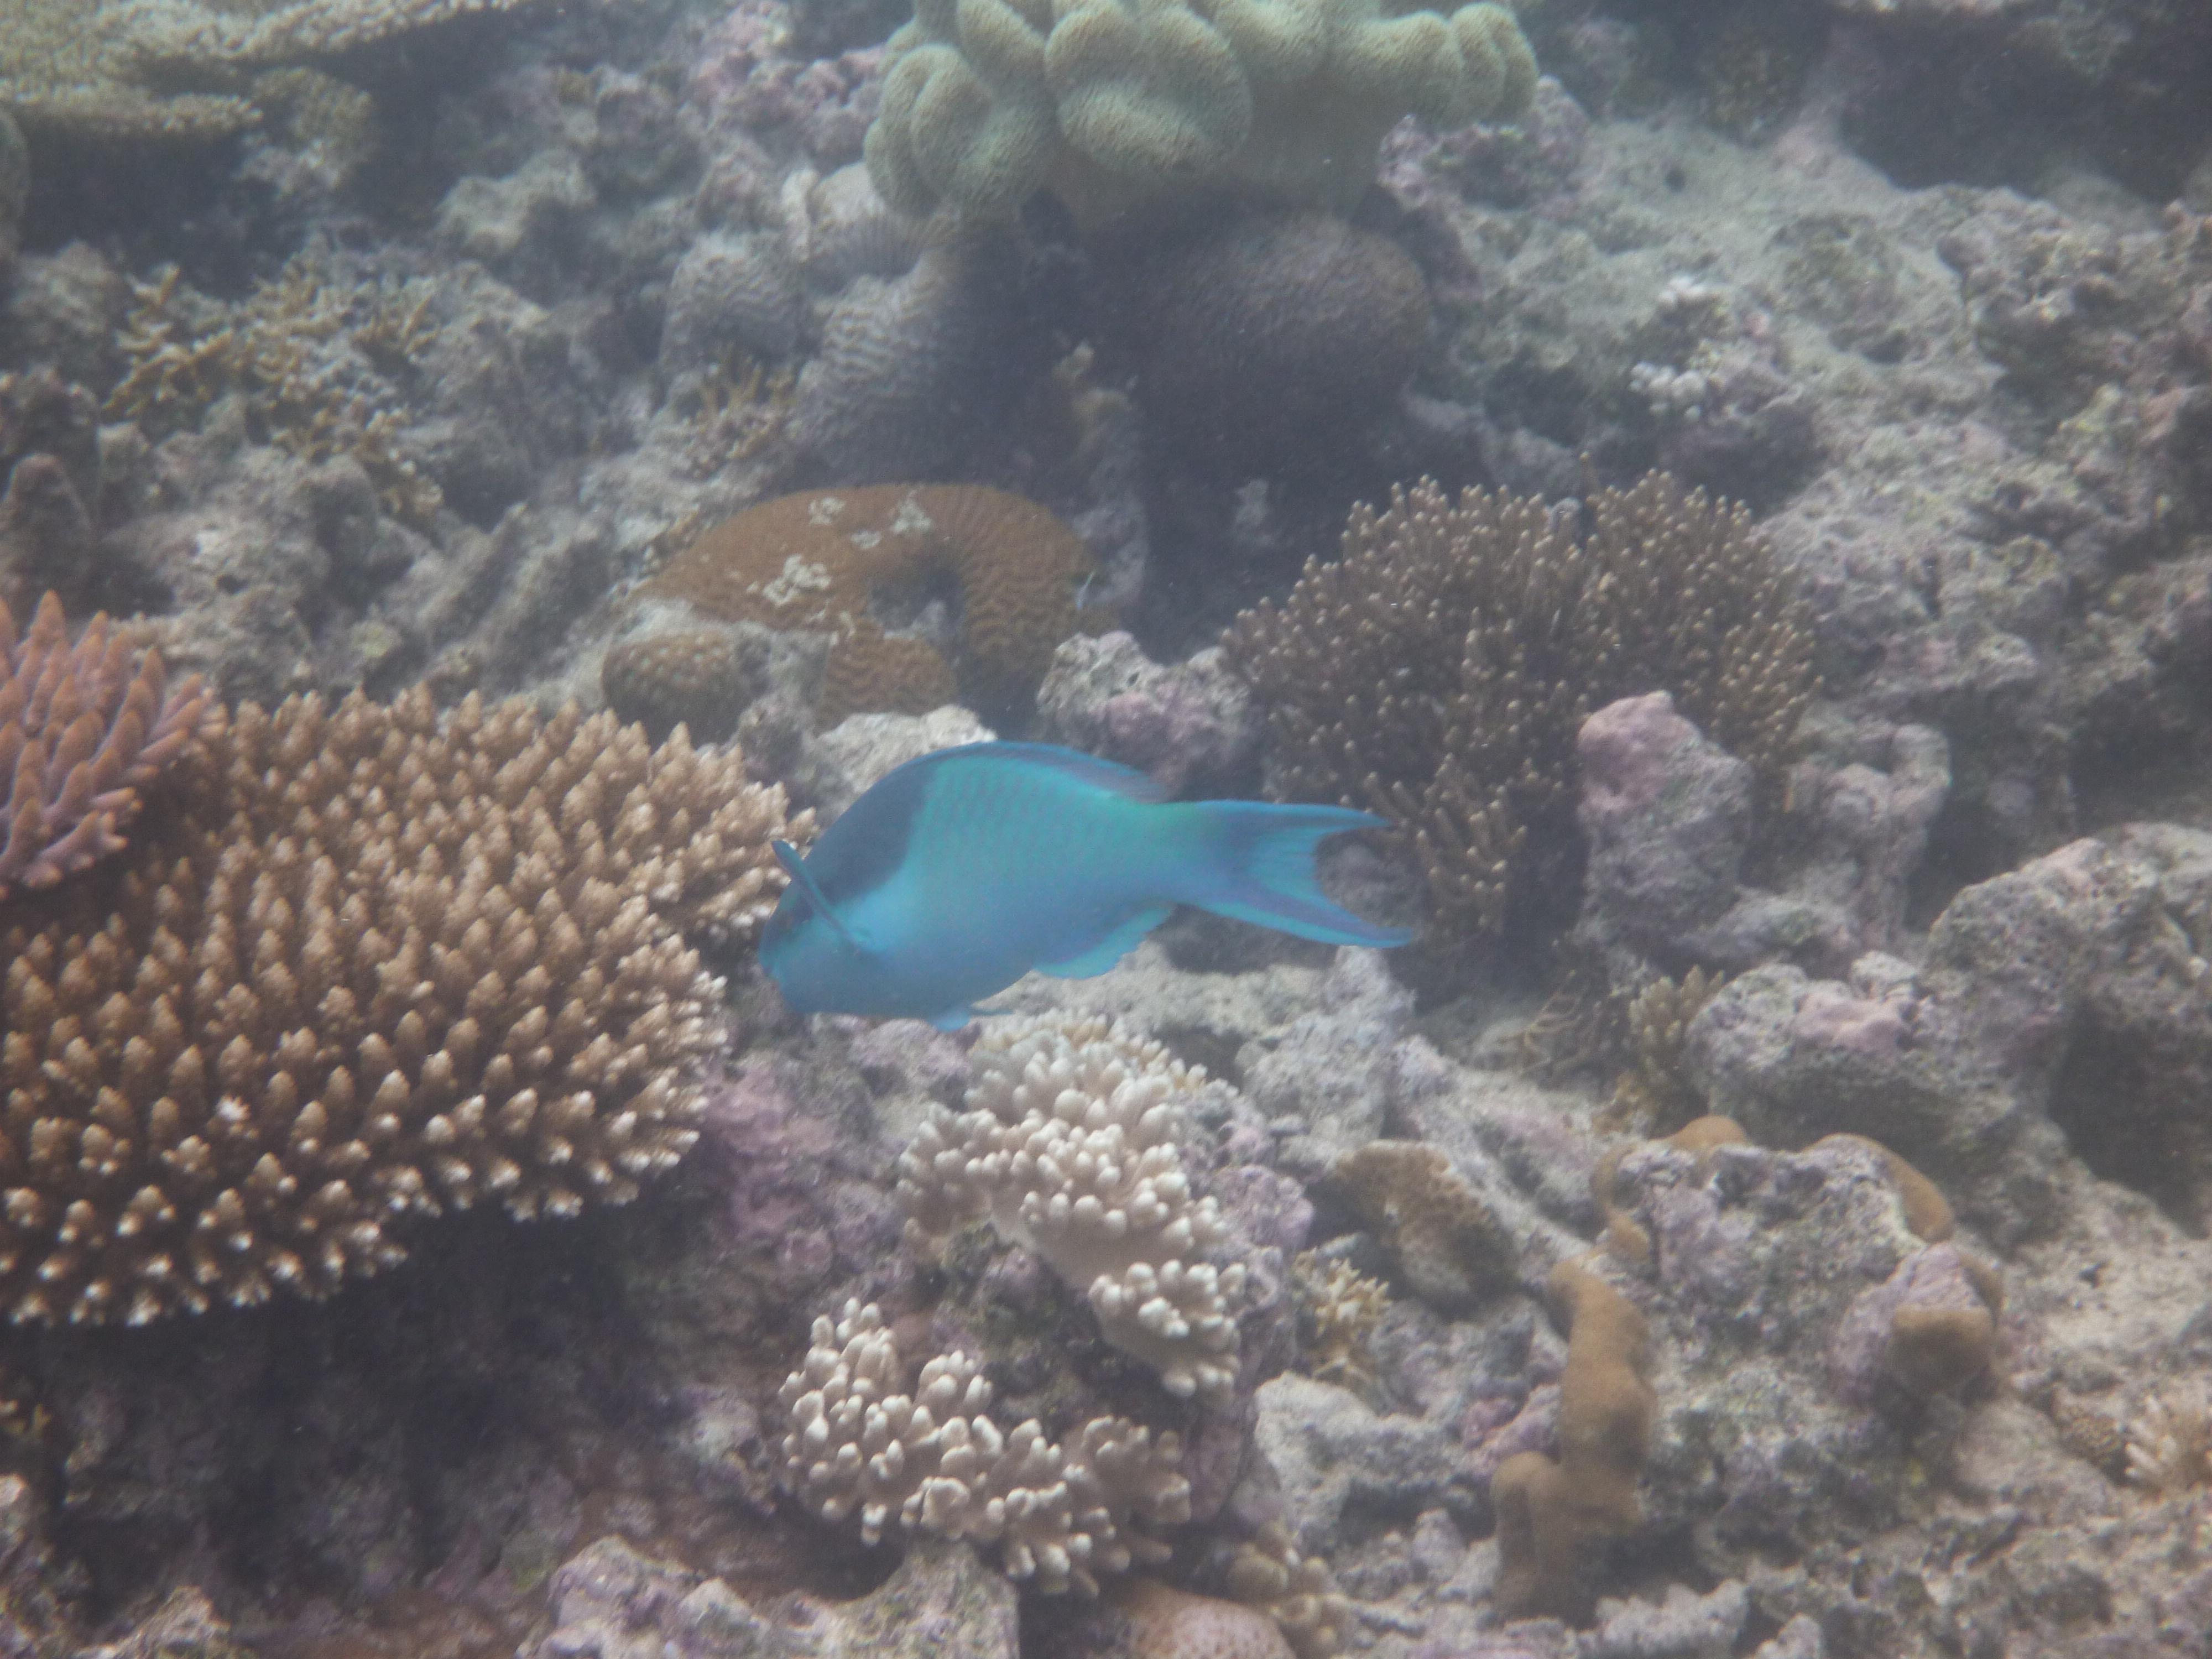 Underwater - Great Barrier Reef Nivedita Chaman